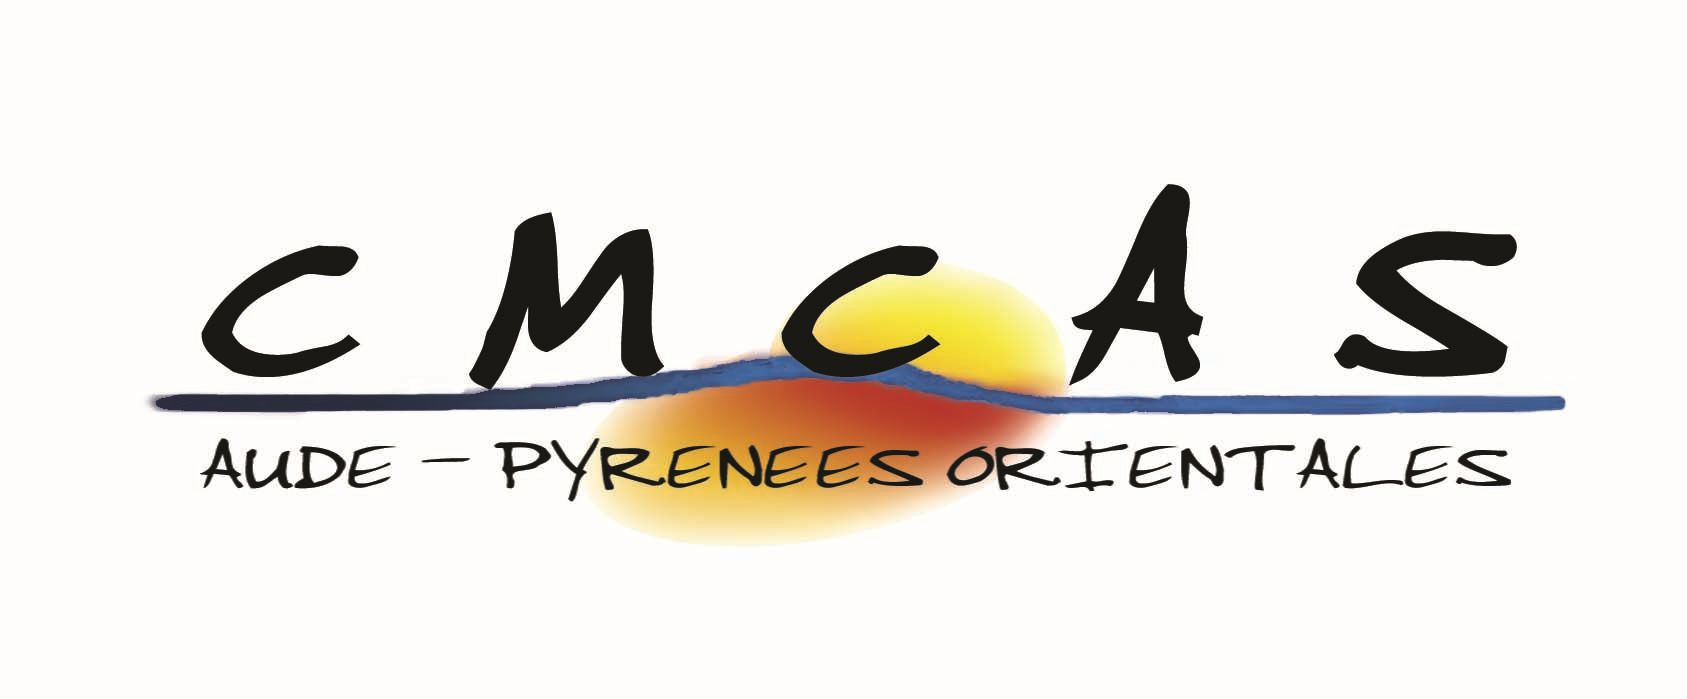 Logo CMCAS Aude Pyrénées Orientales